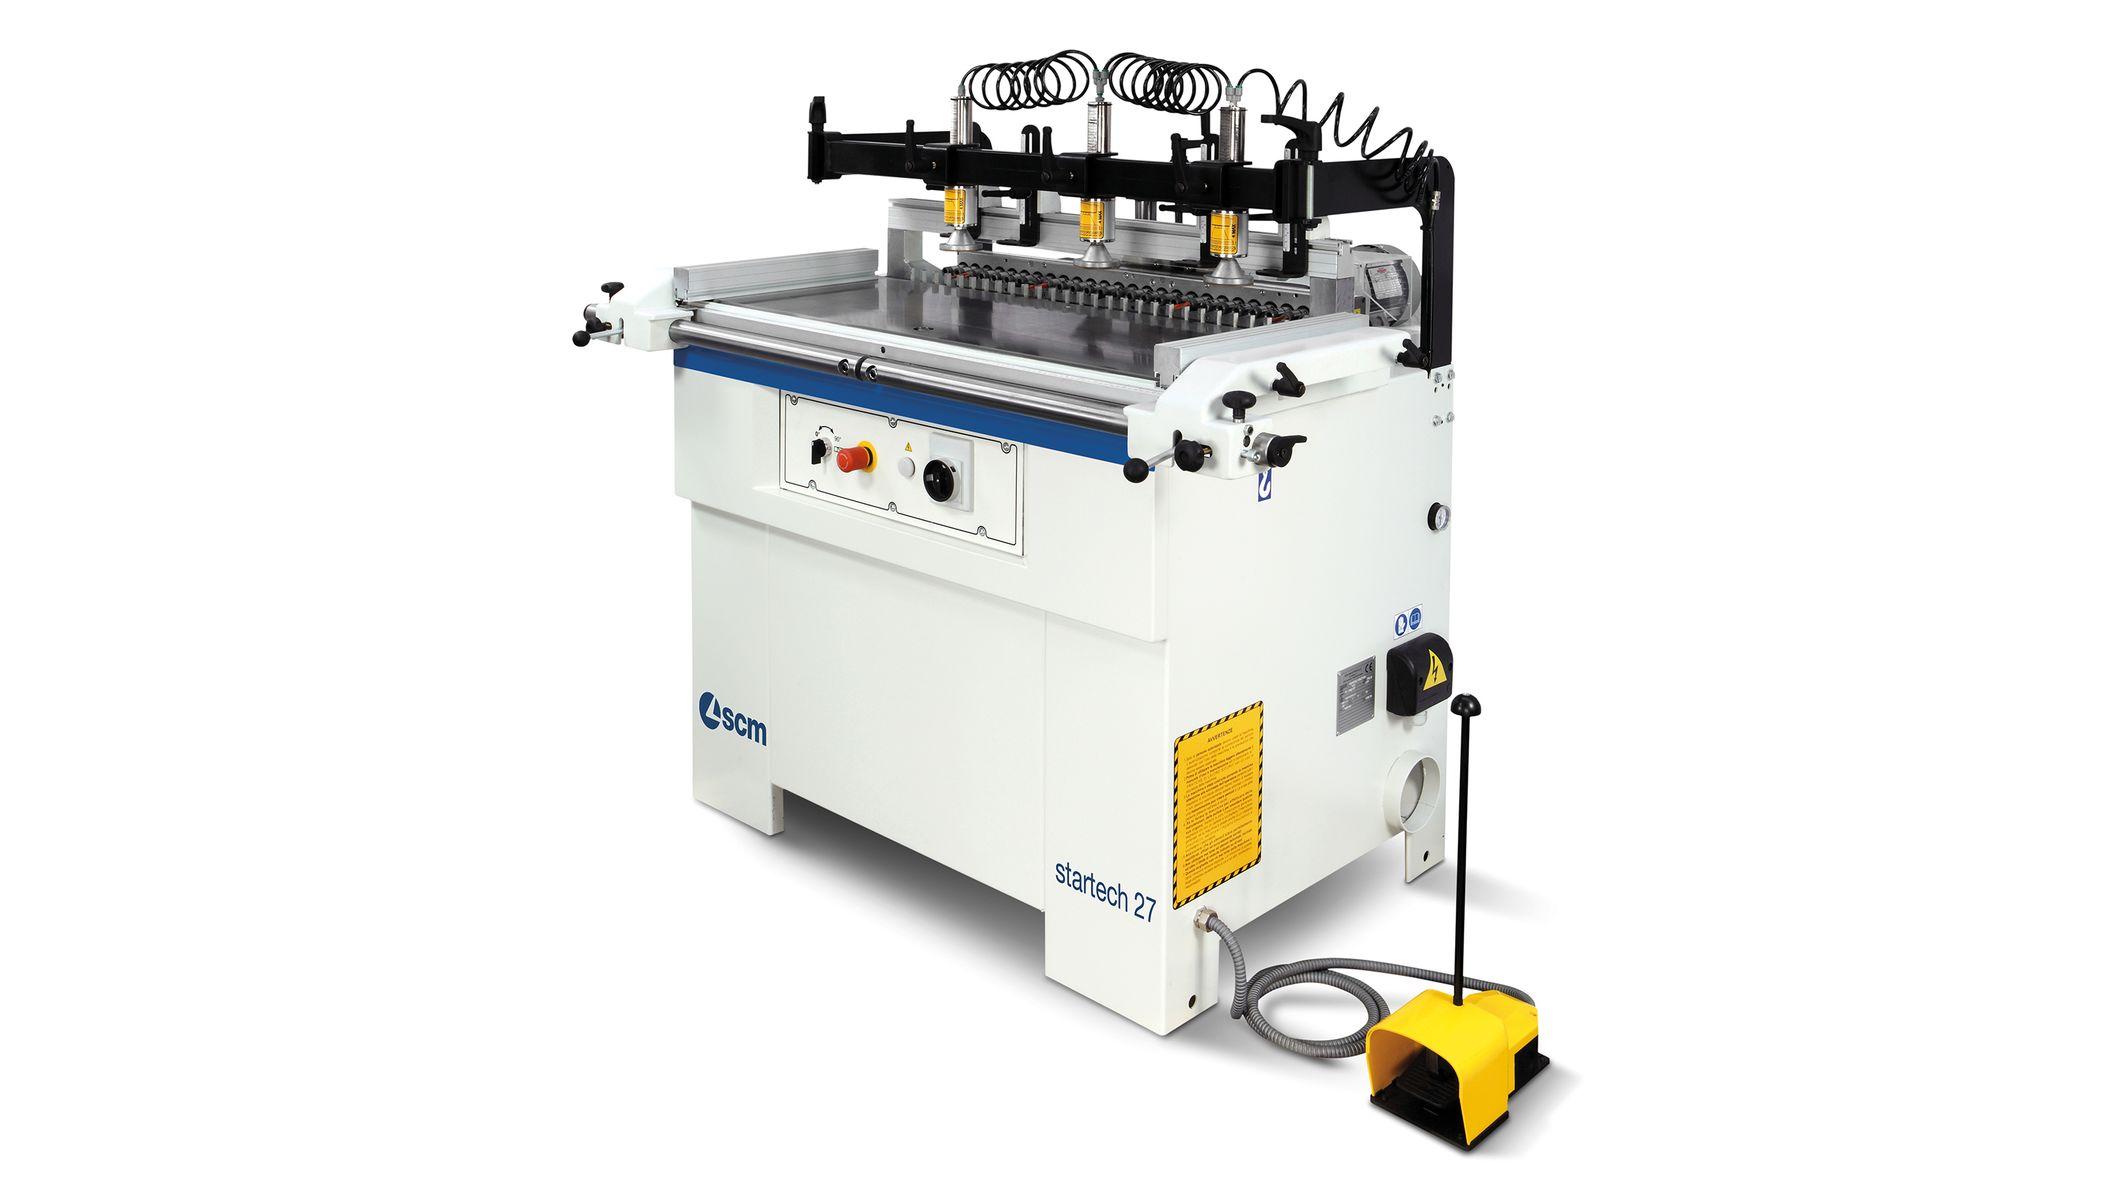 startech 614 semi automatic boring machine